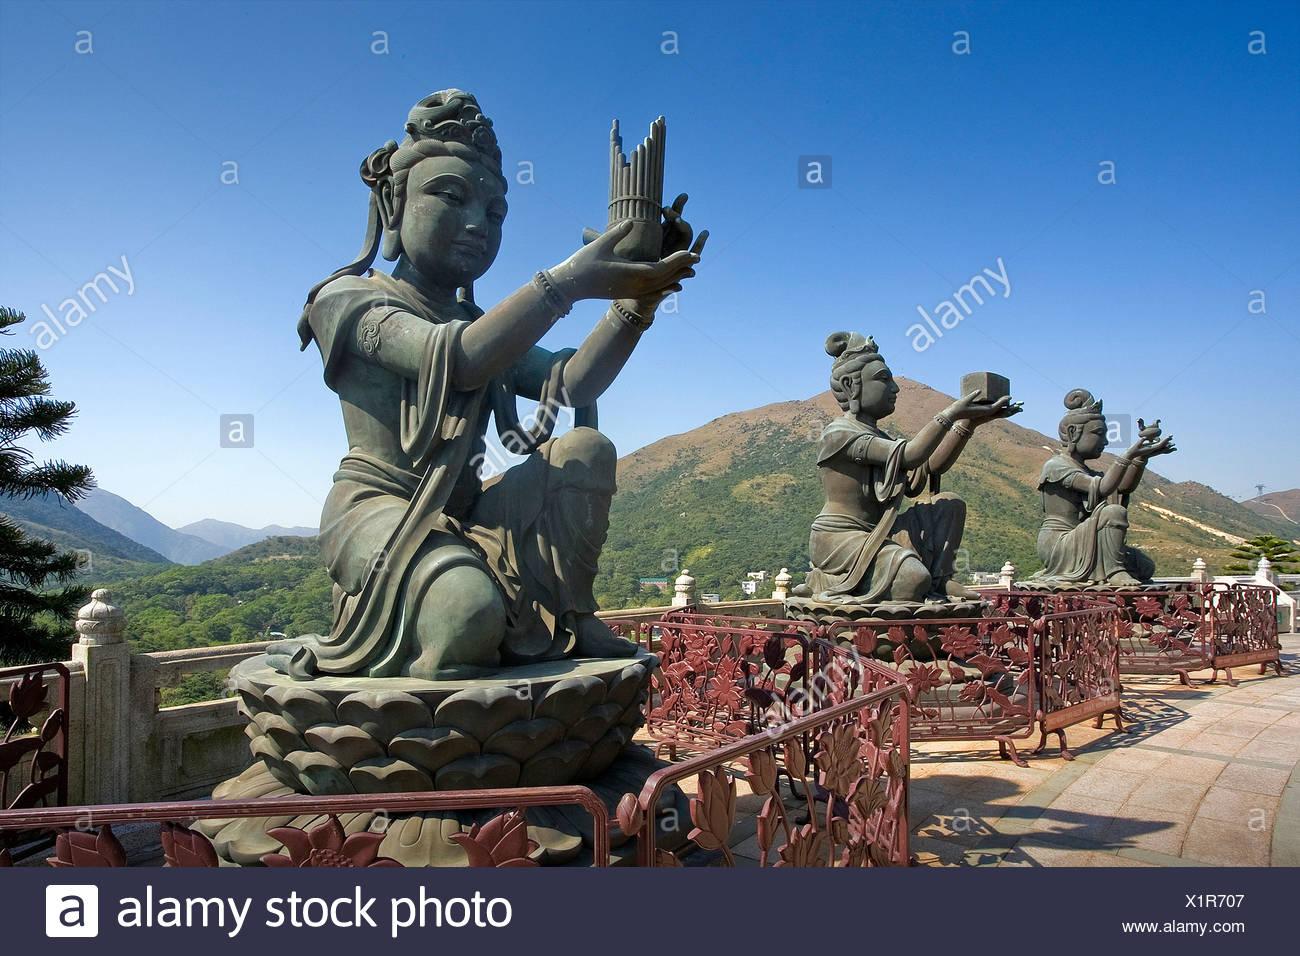 Hong Kong Hongkong Asia Lantau Iceland sculptures figures religion culture Stock Photo